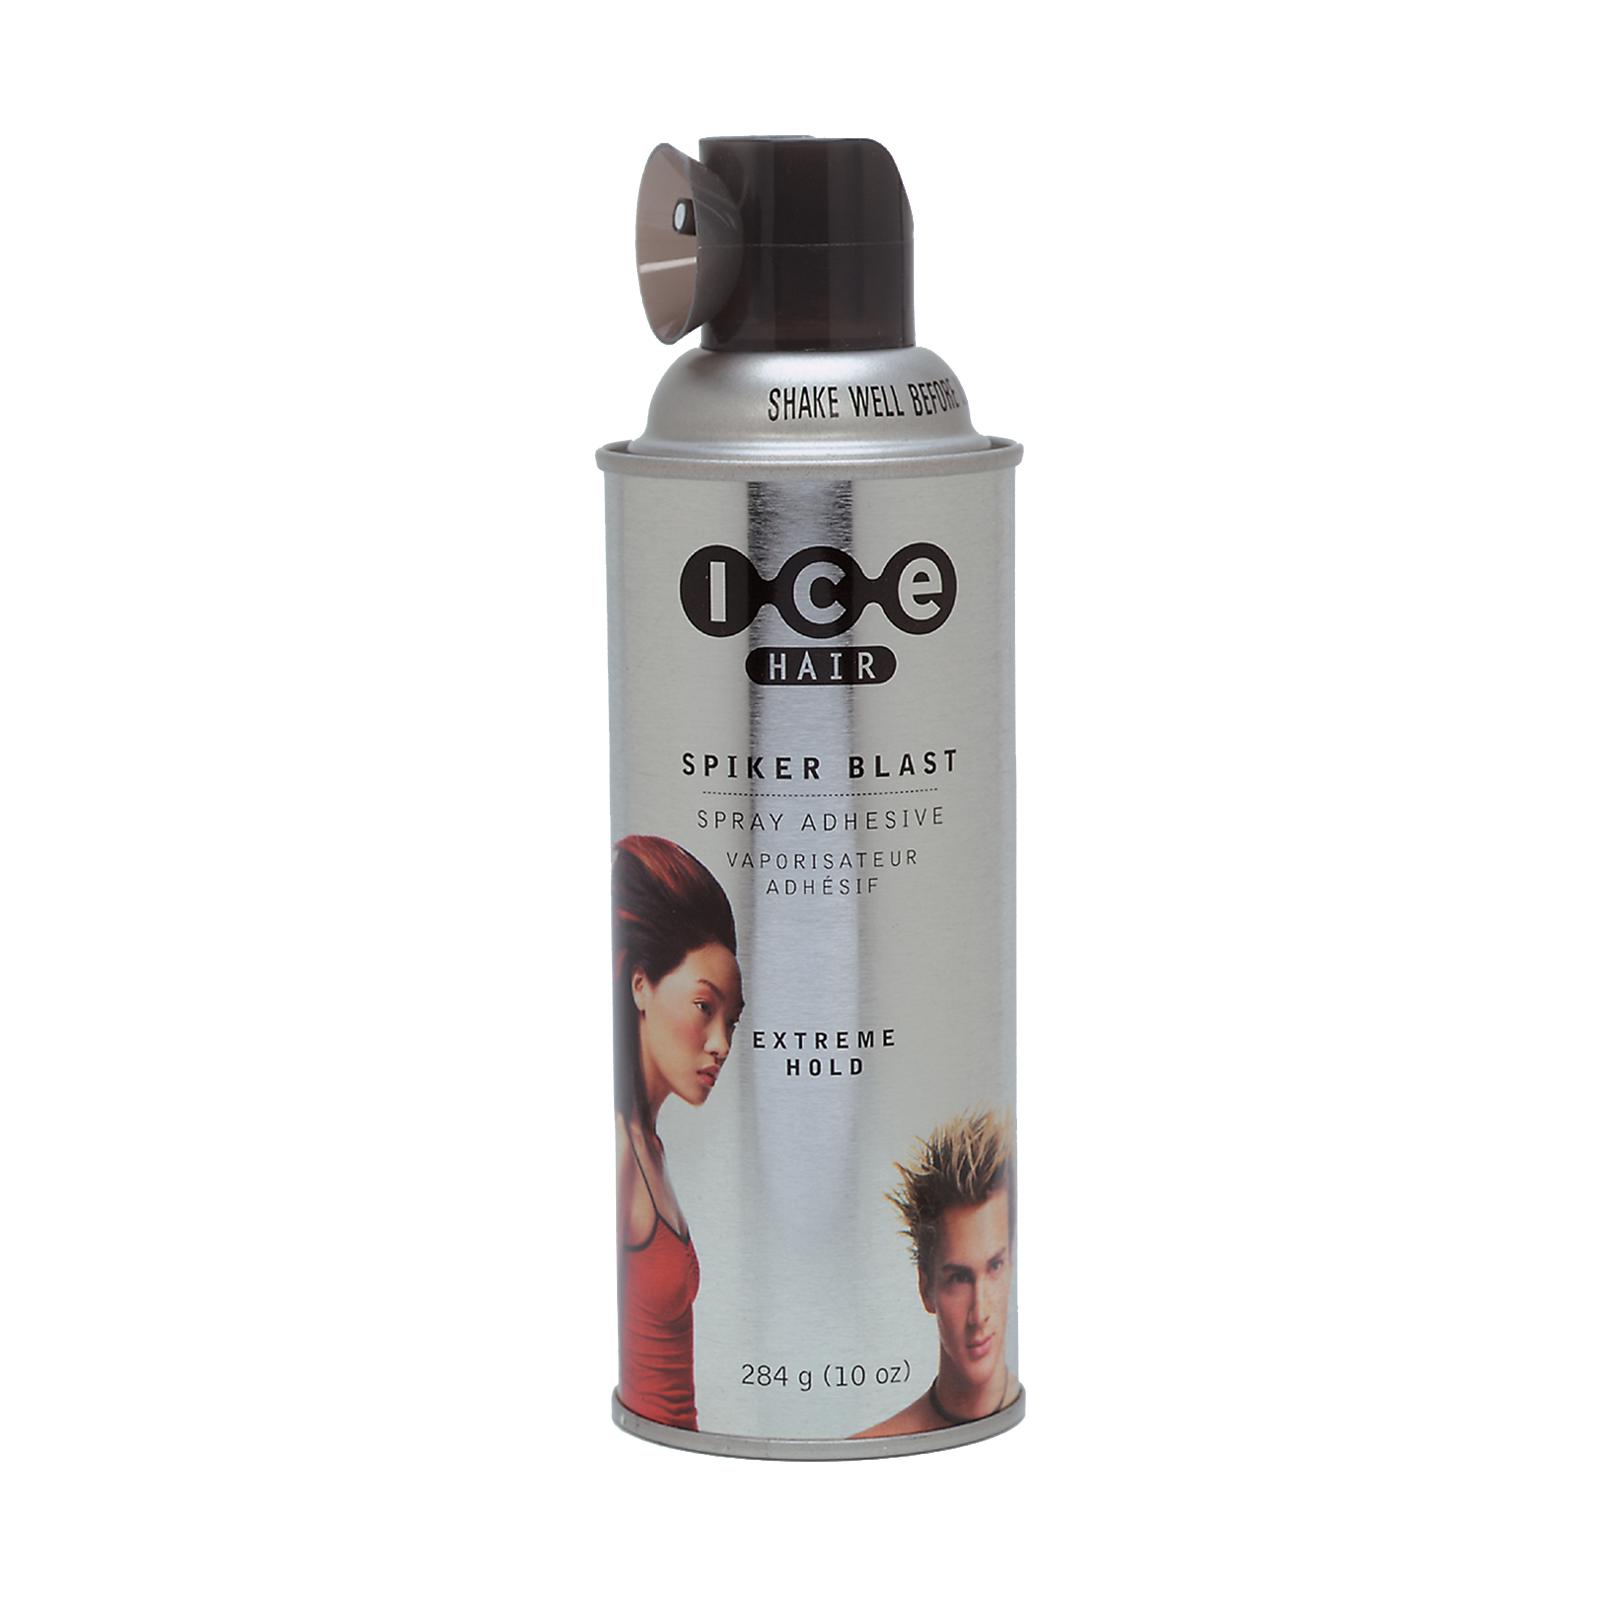 ICE Hair Spiker Blast Spray Adhesive Joico